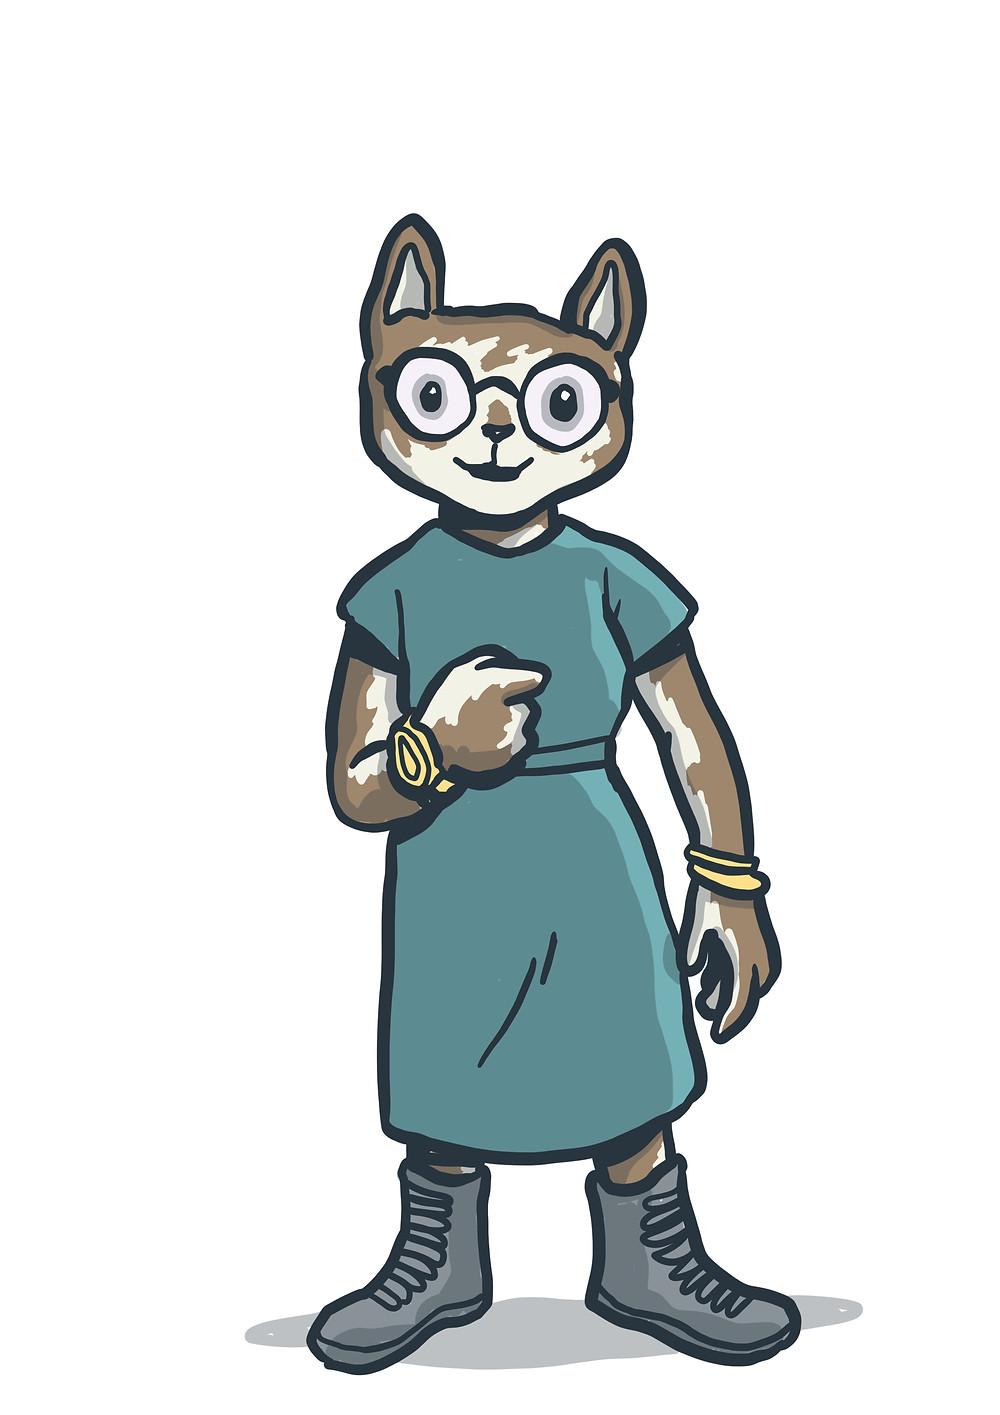 A picture of a cat in a blue dress